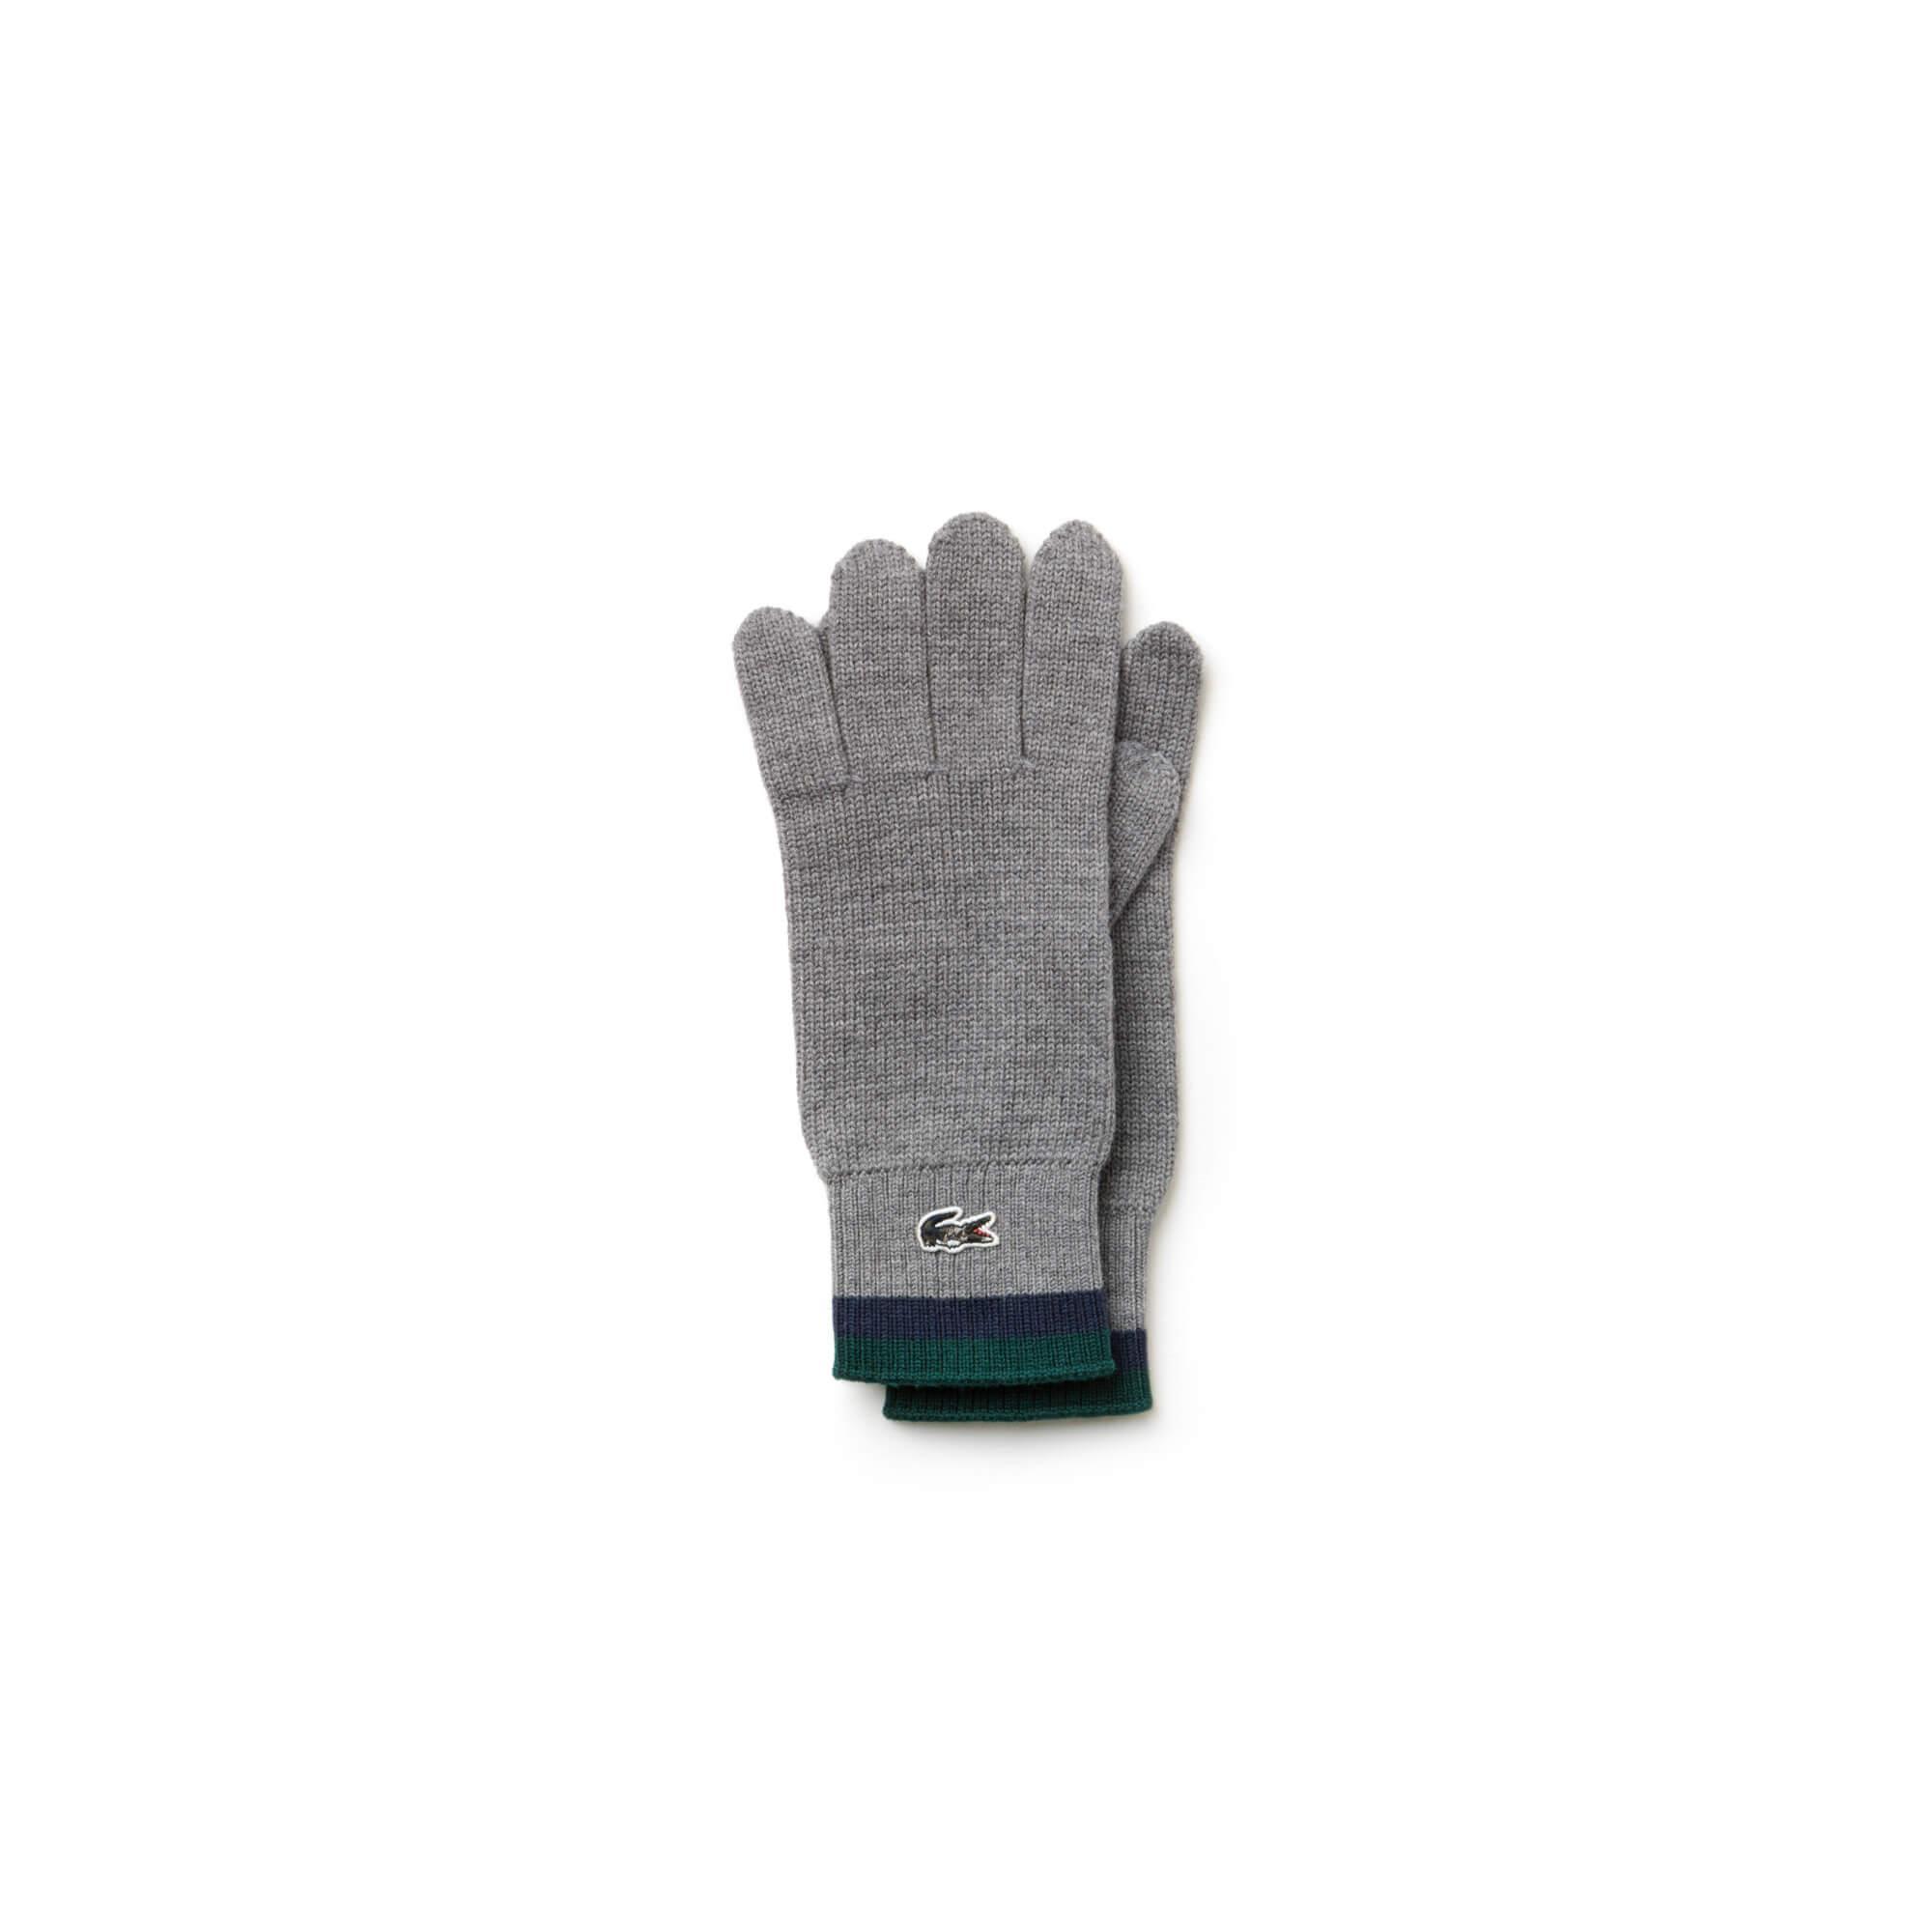 Lacoste Men's Gloves